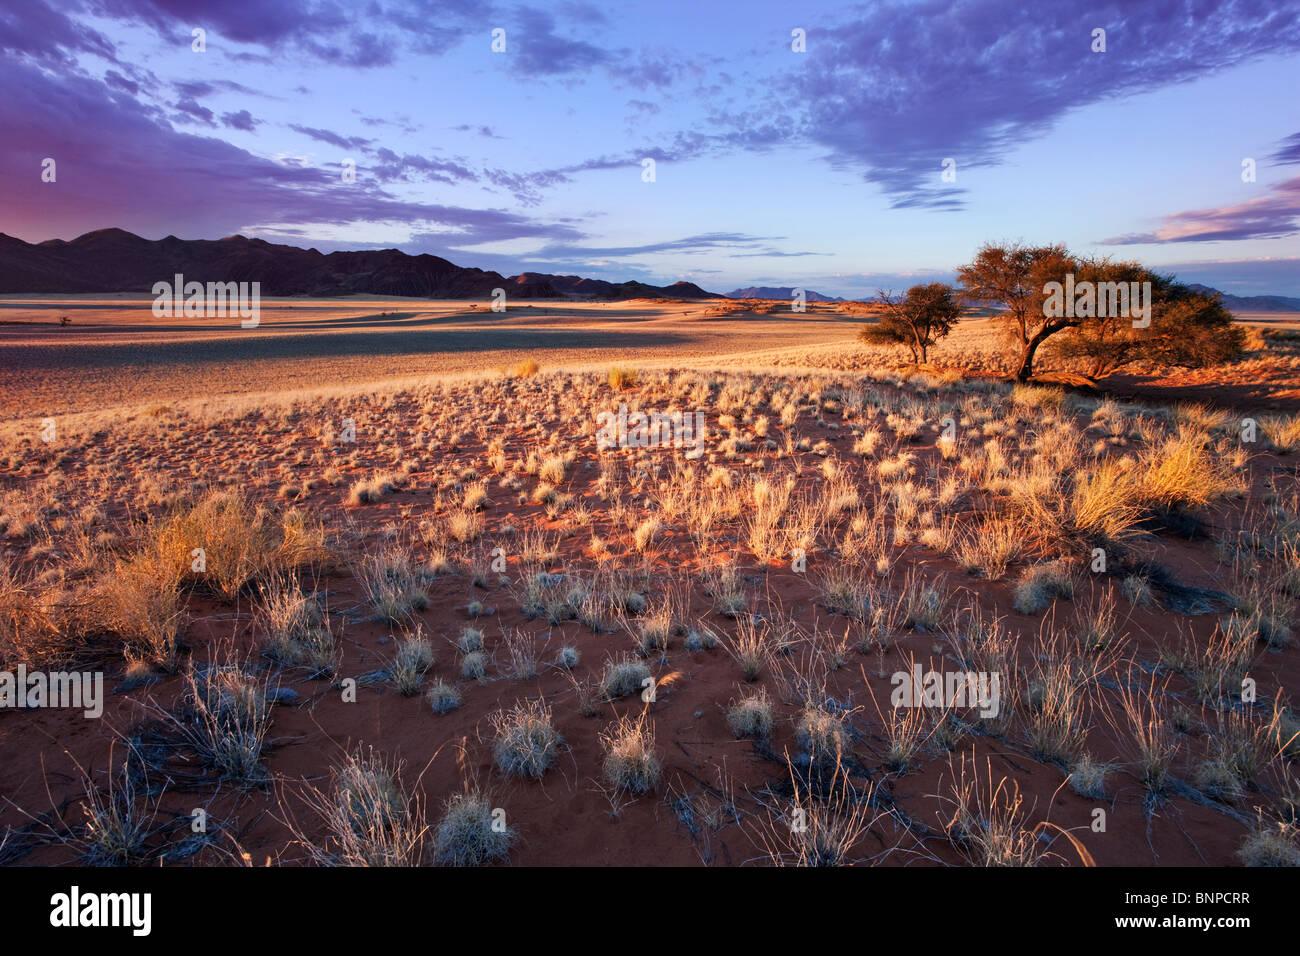 Impostazione sole illumina panorami unici di sud-ovest Namib Desert o pro-Namib. NamibRand Riserva Naturale, Namibia Immagini Stock